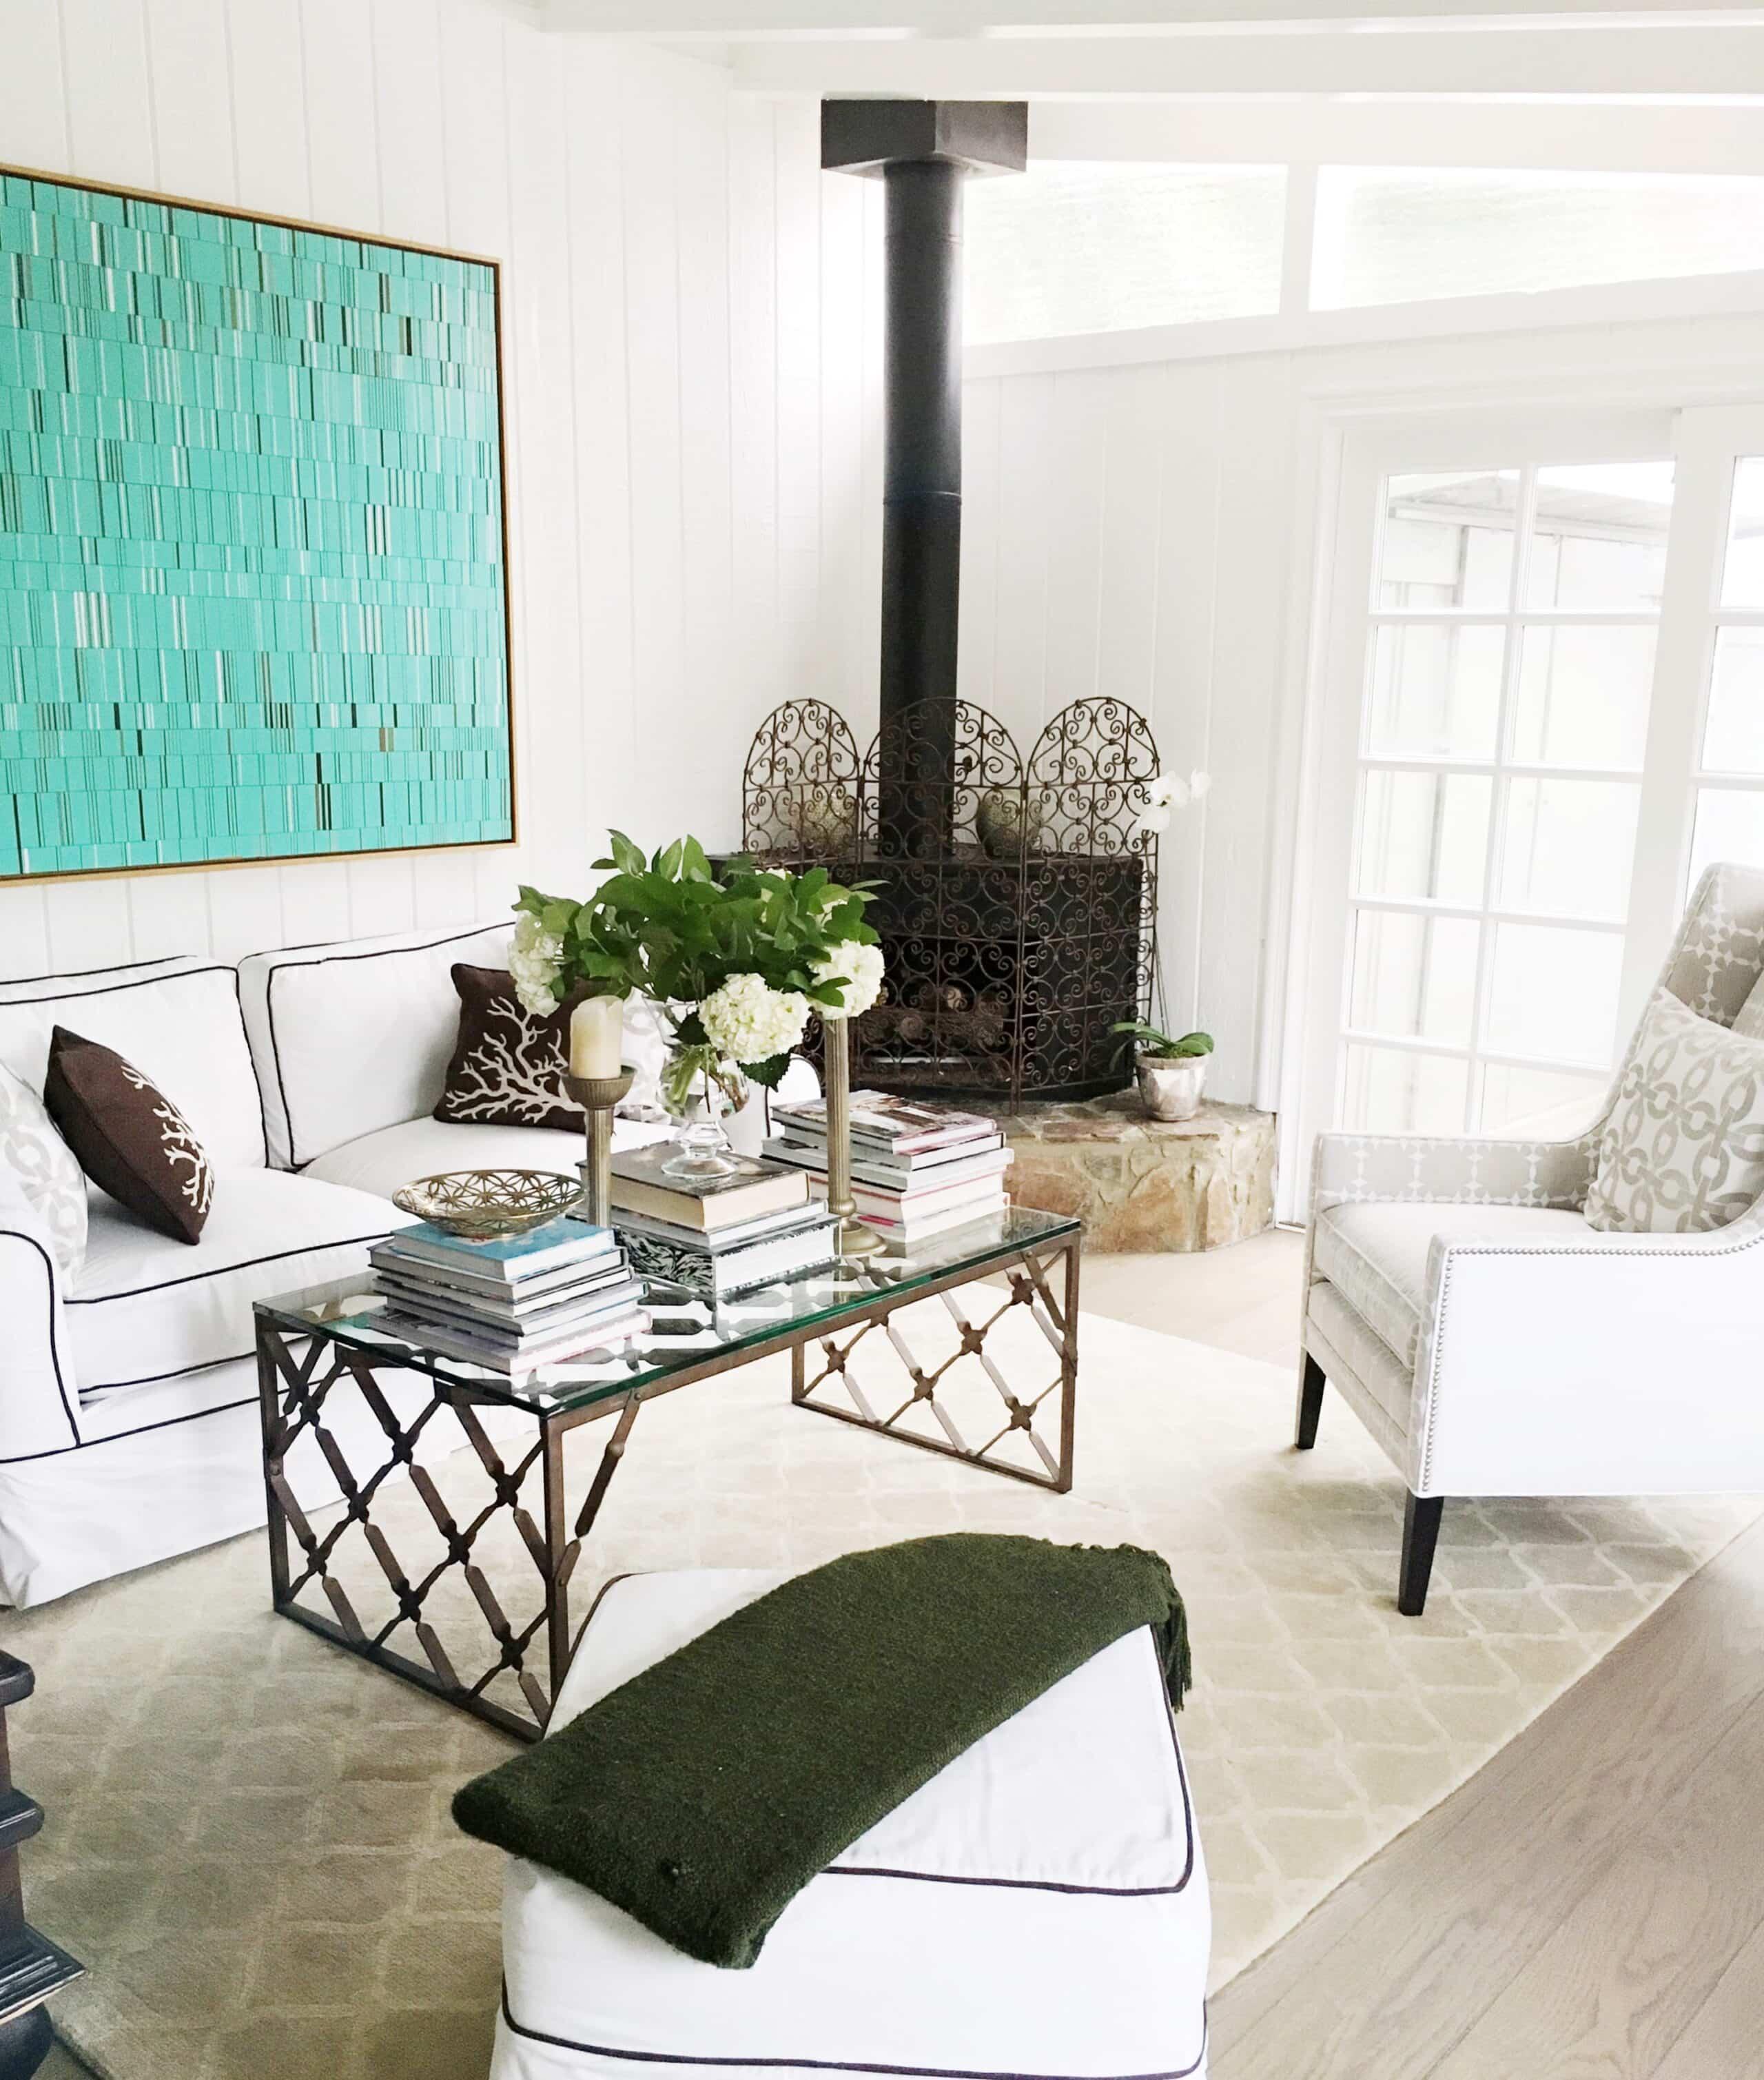 my living room flower arrangement options cococozycococozy living room flower arrangement hydrangea